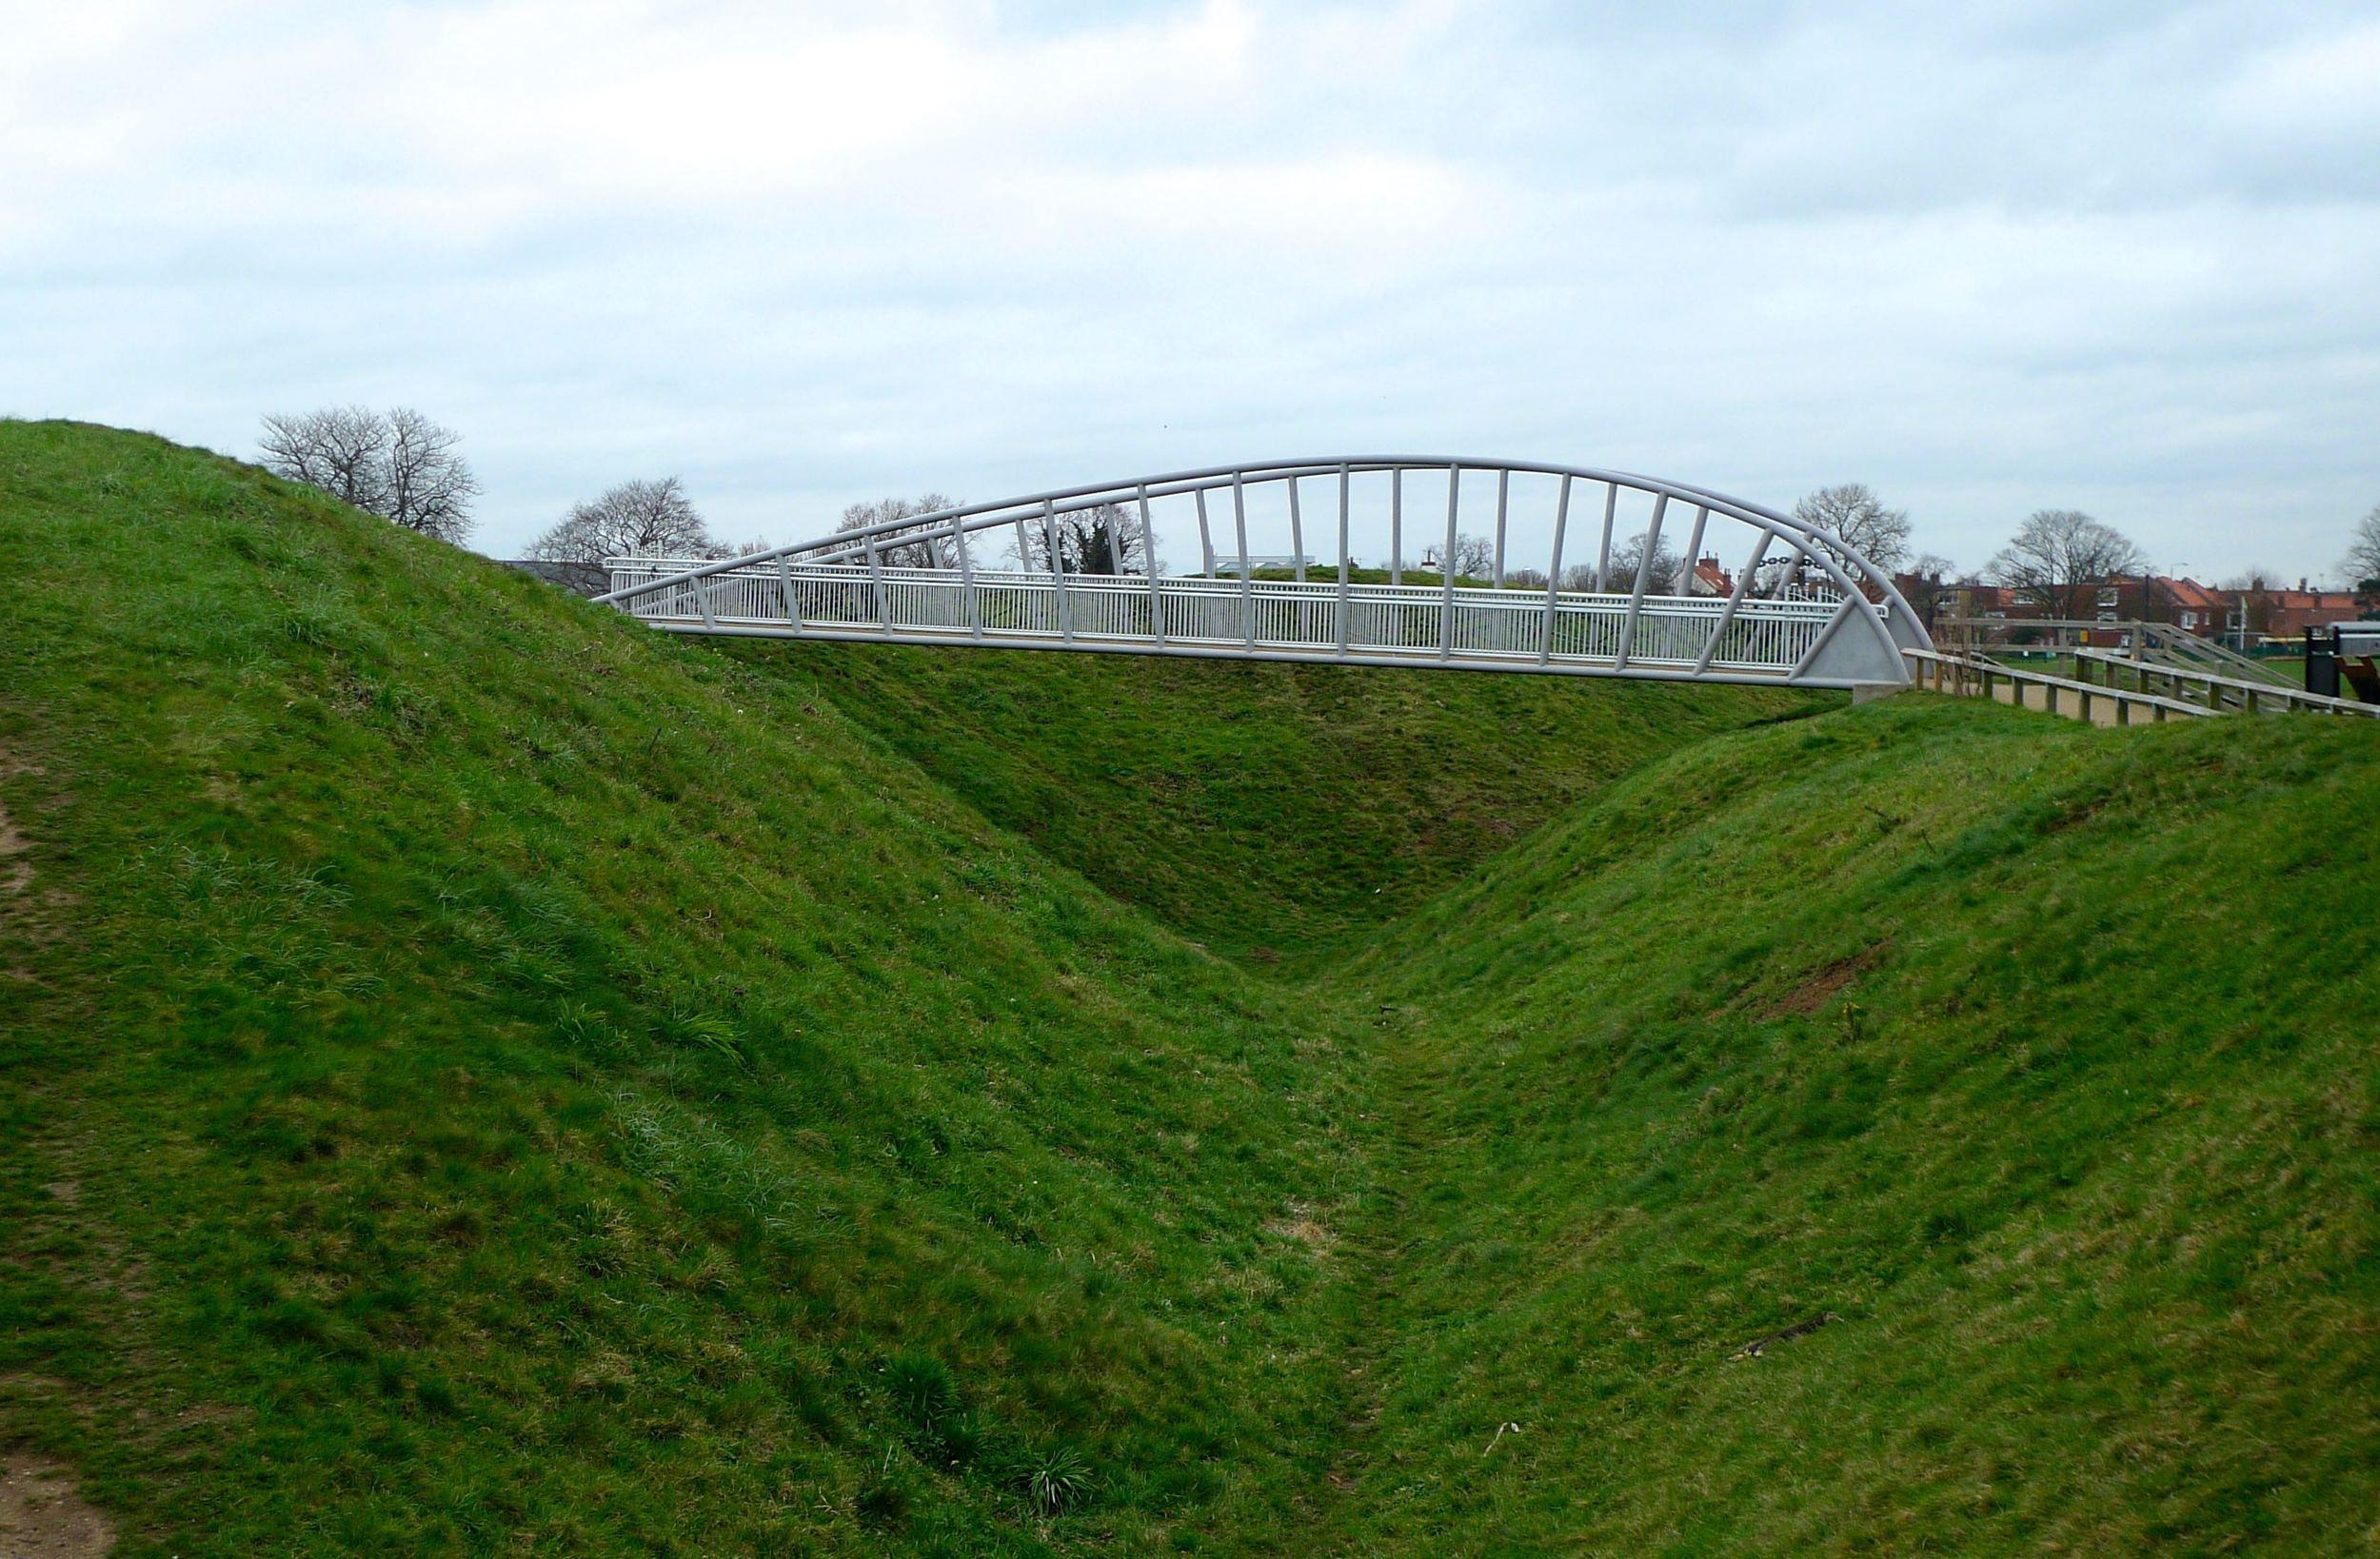 Ironwork bridge